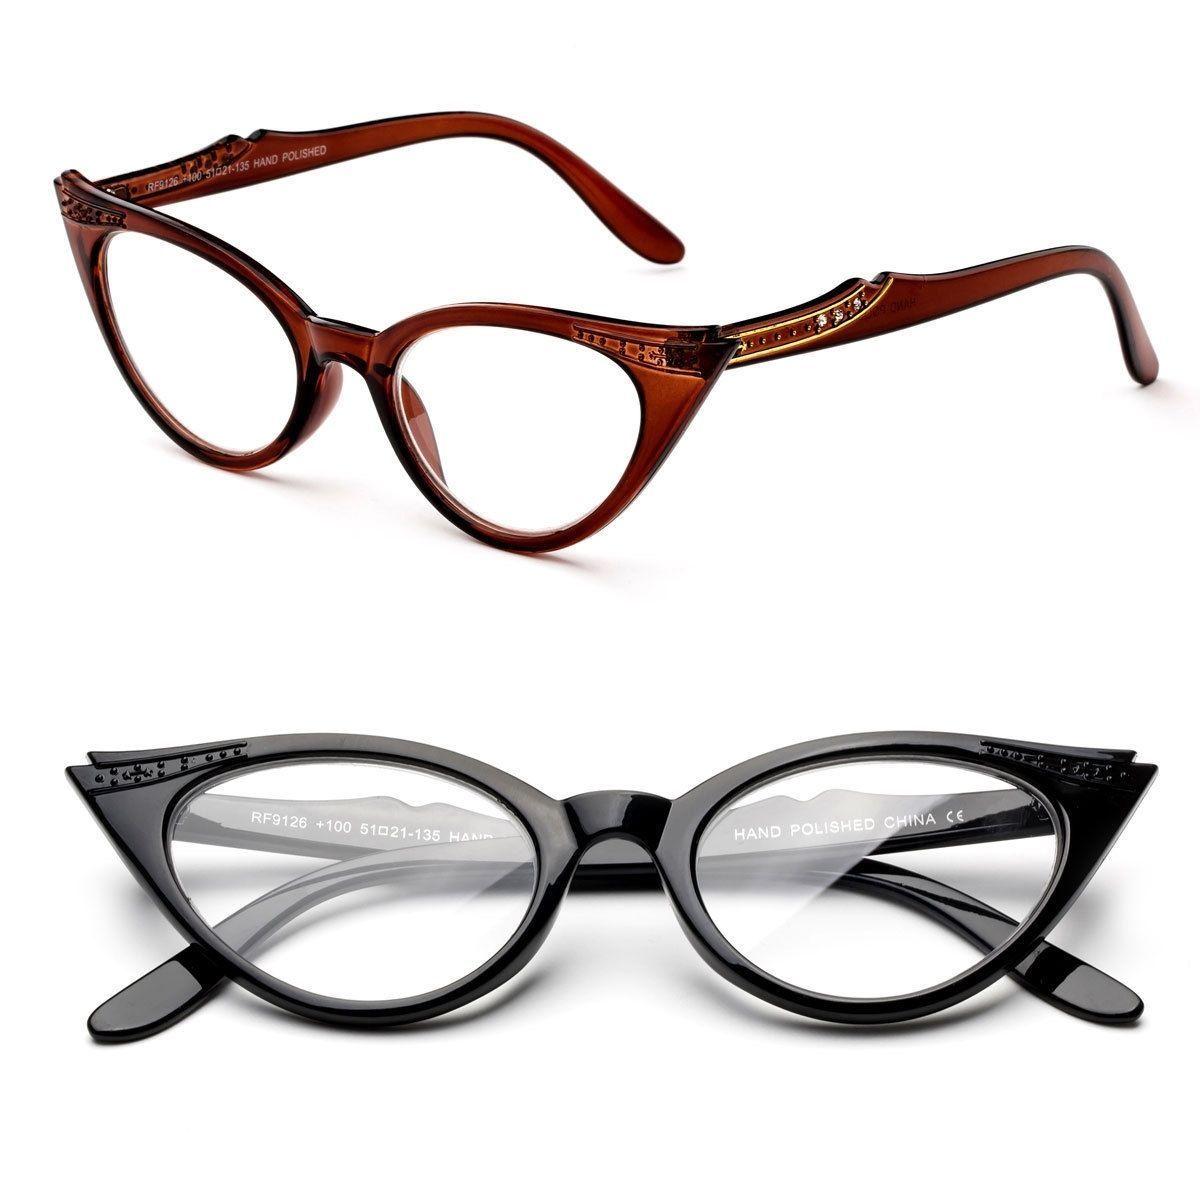 38b19d813547  7.99 - Fashion Cat Eyed Frame Reading Glasses Temple Design Tort Black  Brown  ebay  Fashion